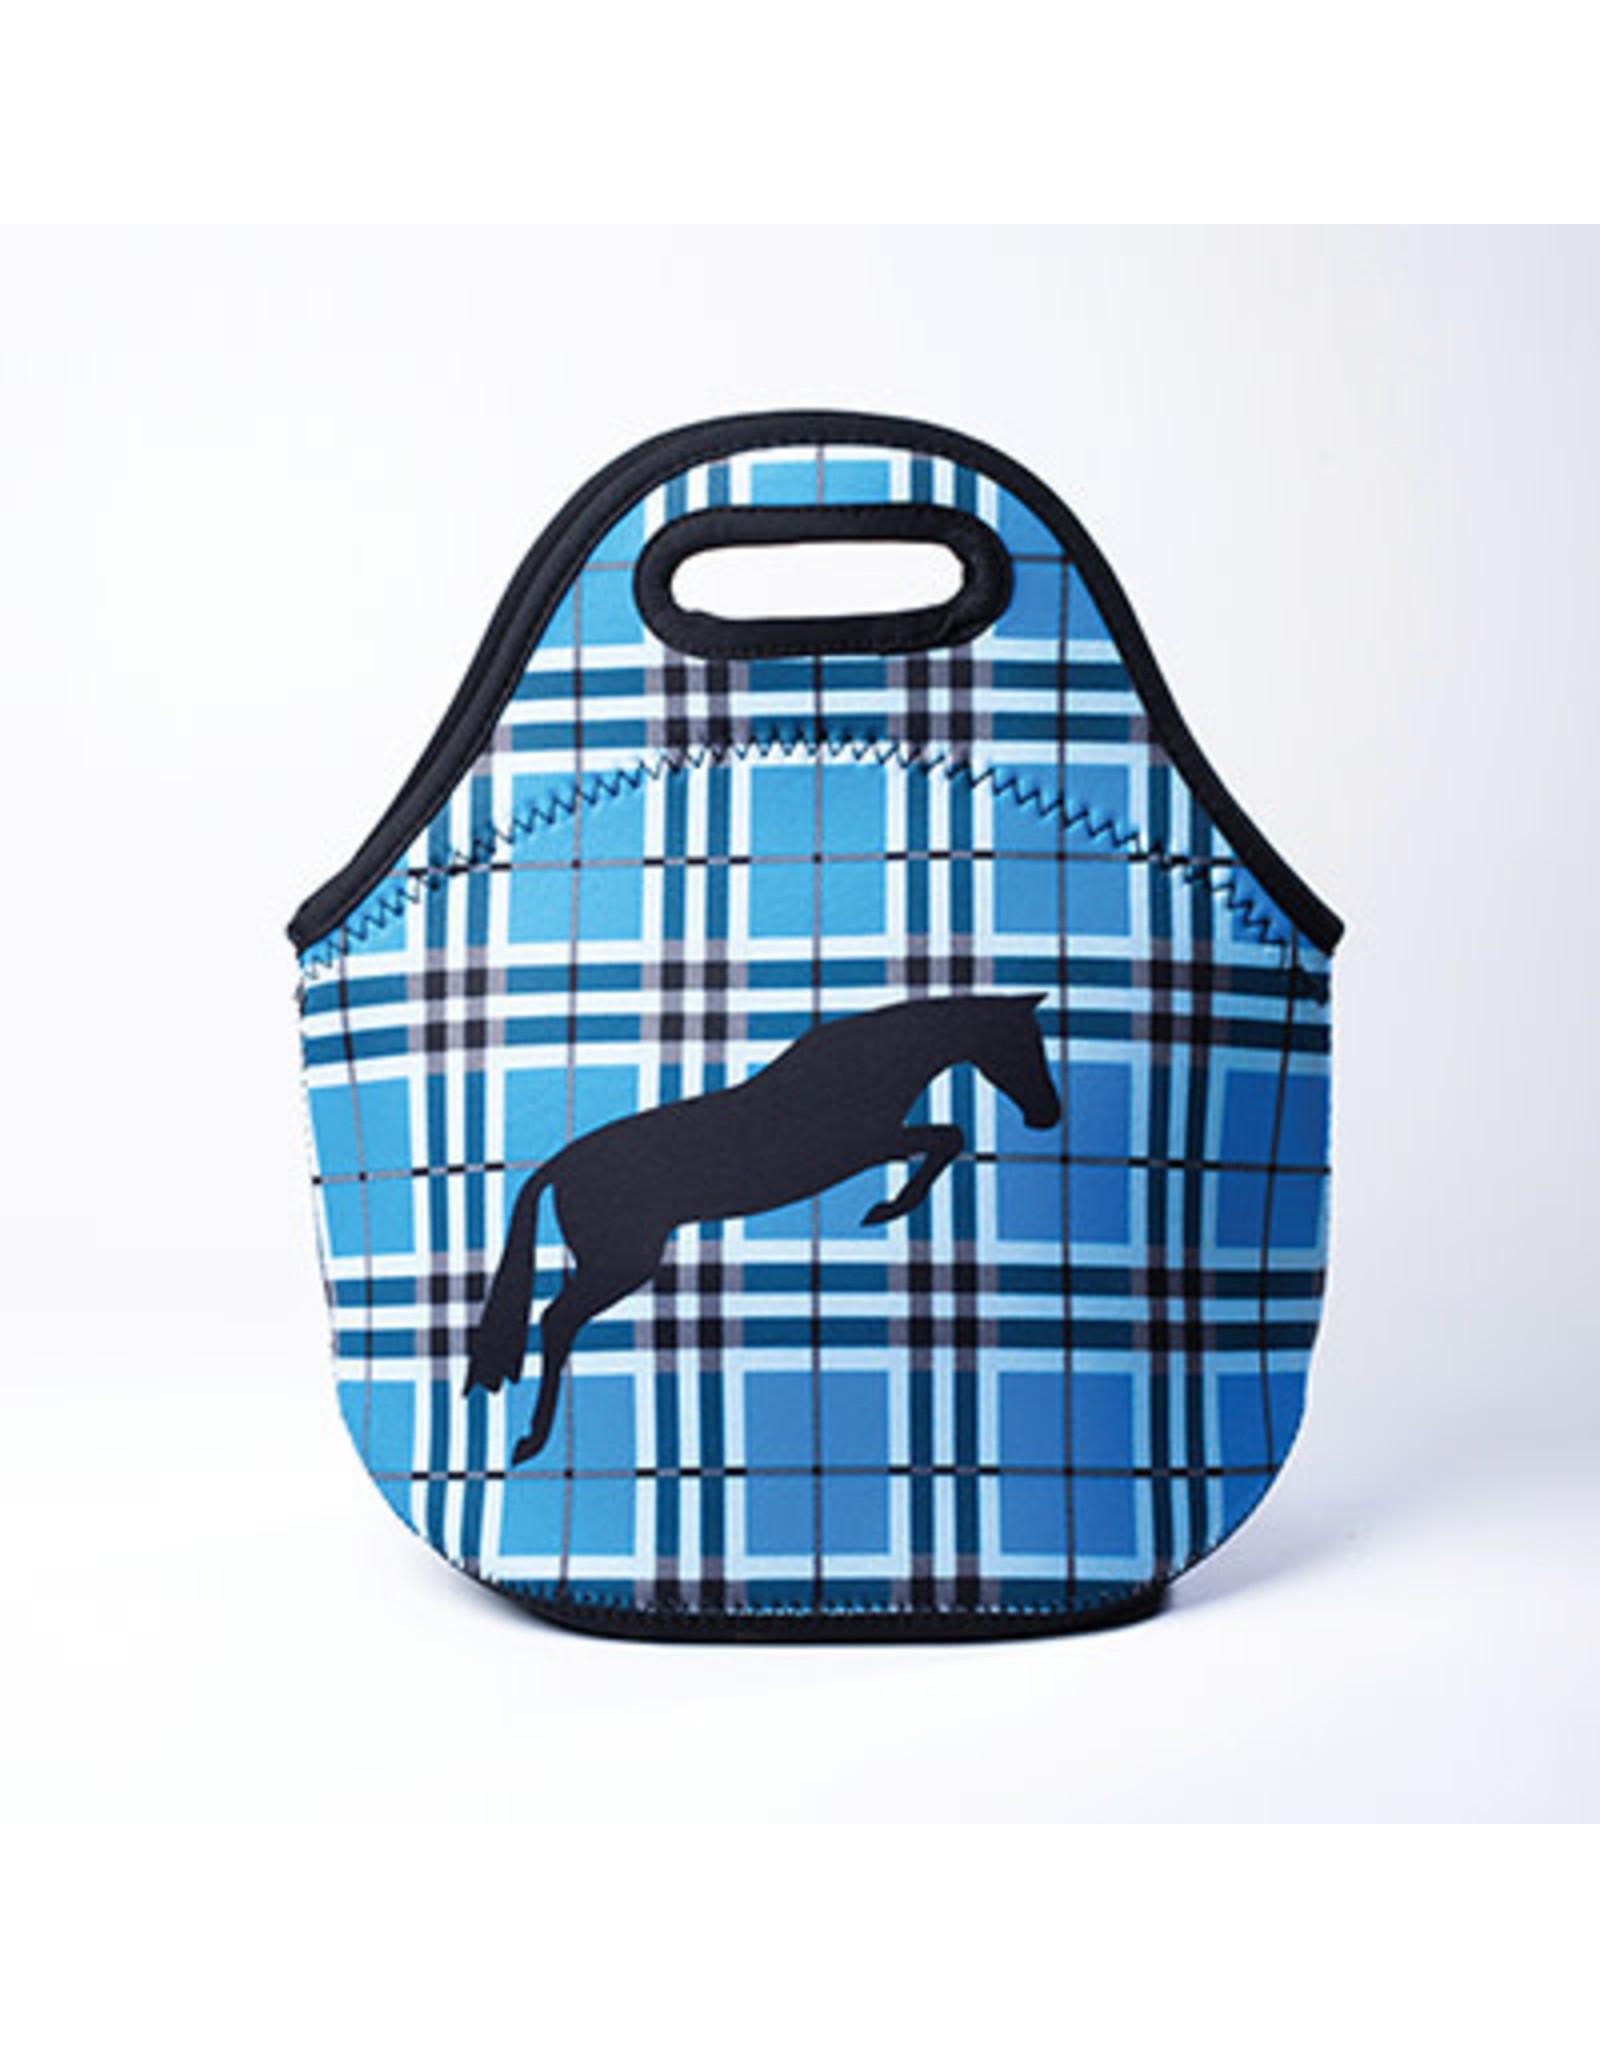 Lunch Tote, Neoprene Blue Plaid W/ Jumper Horse